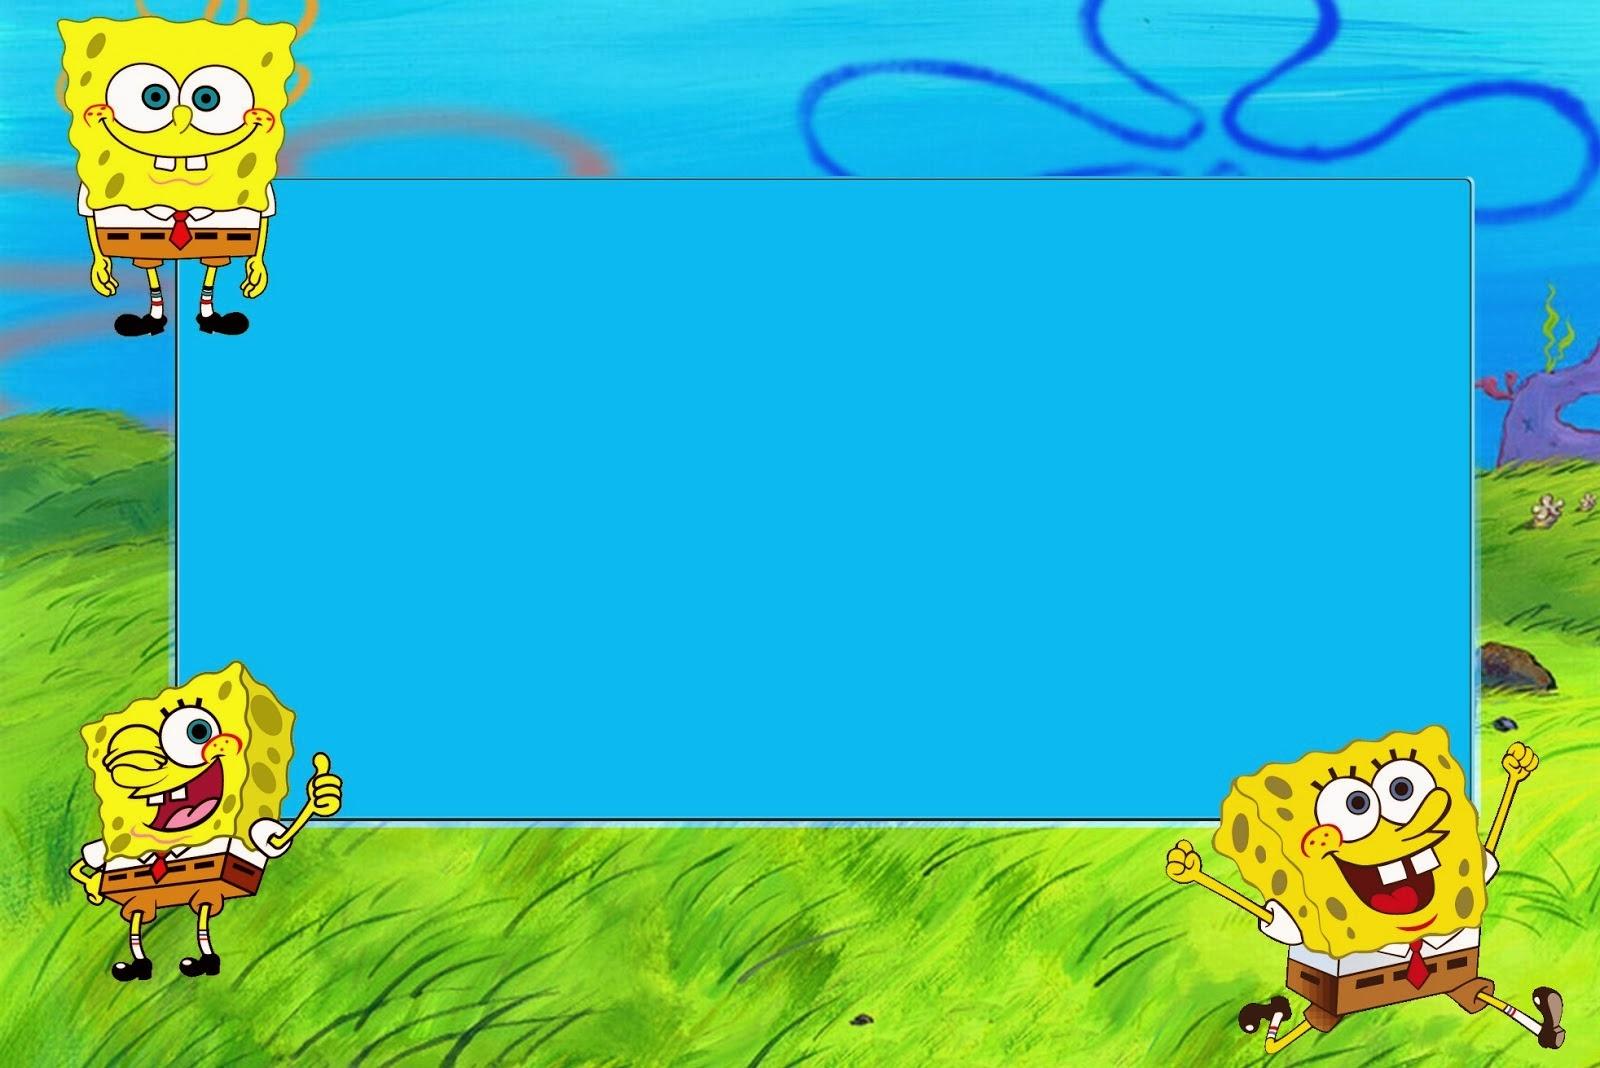 Spongebob Squarepants: Free Printable Cards And Invitations. - Oh My - Spongebob Free Printable Invitations